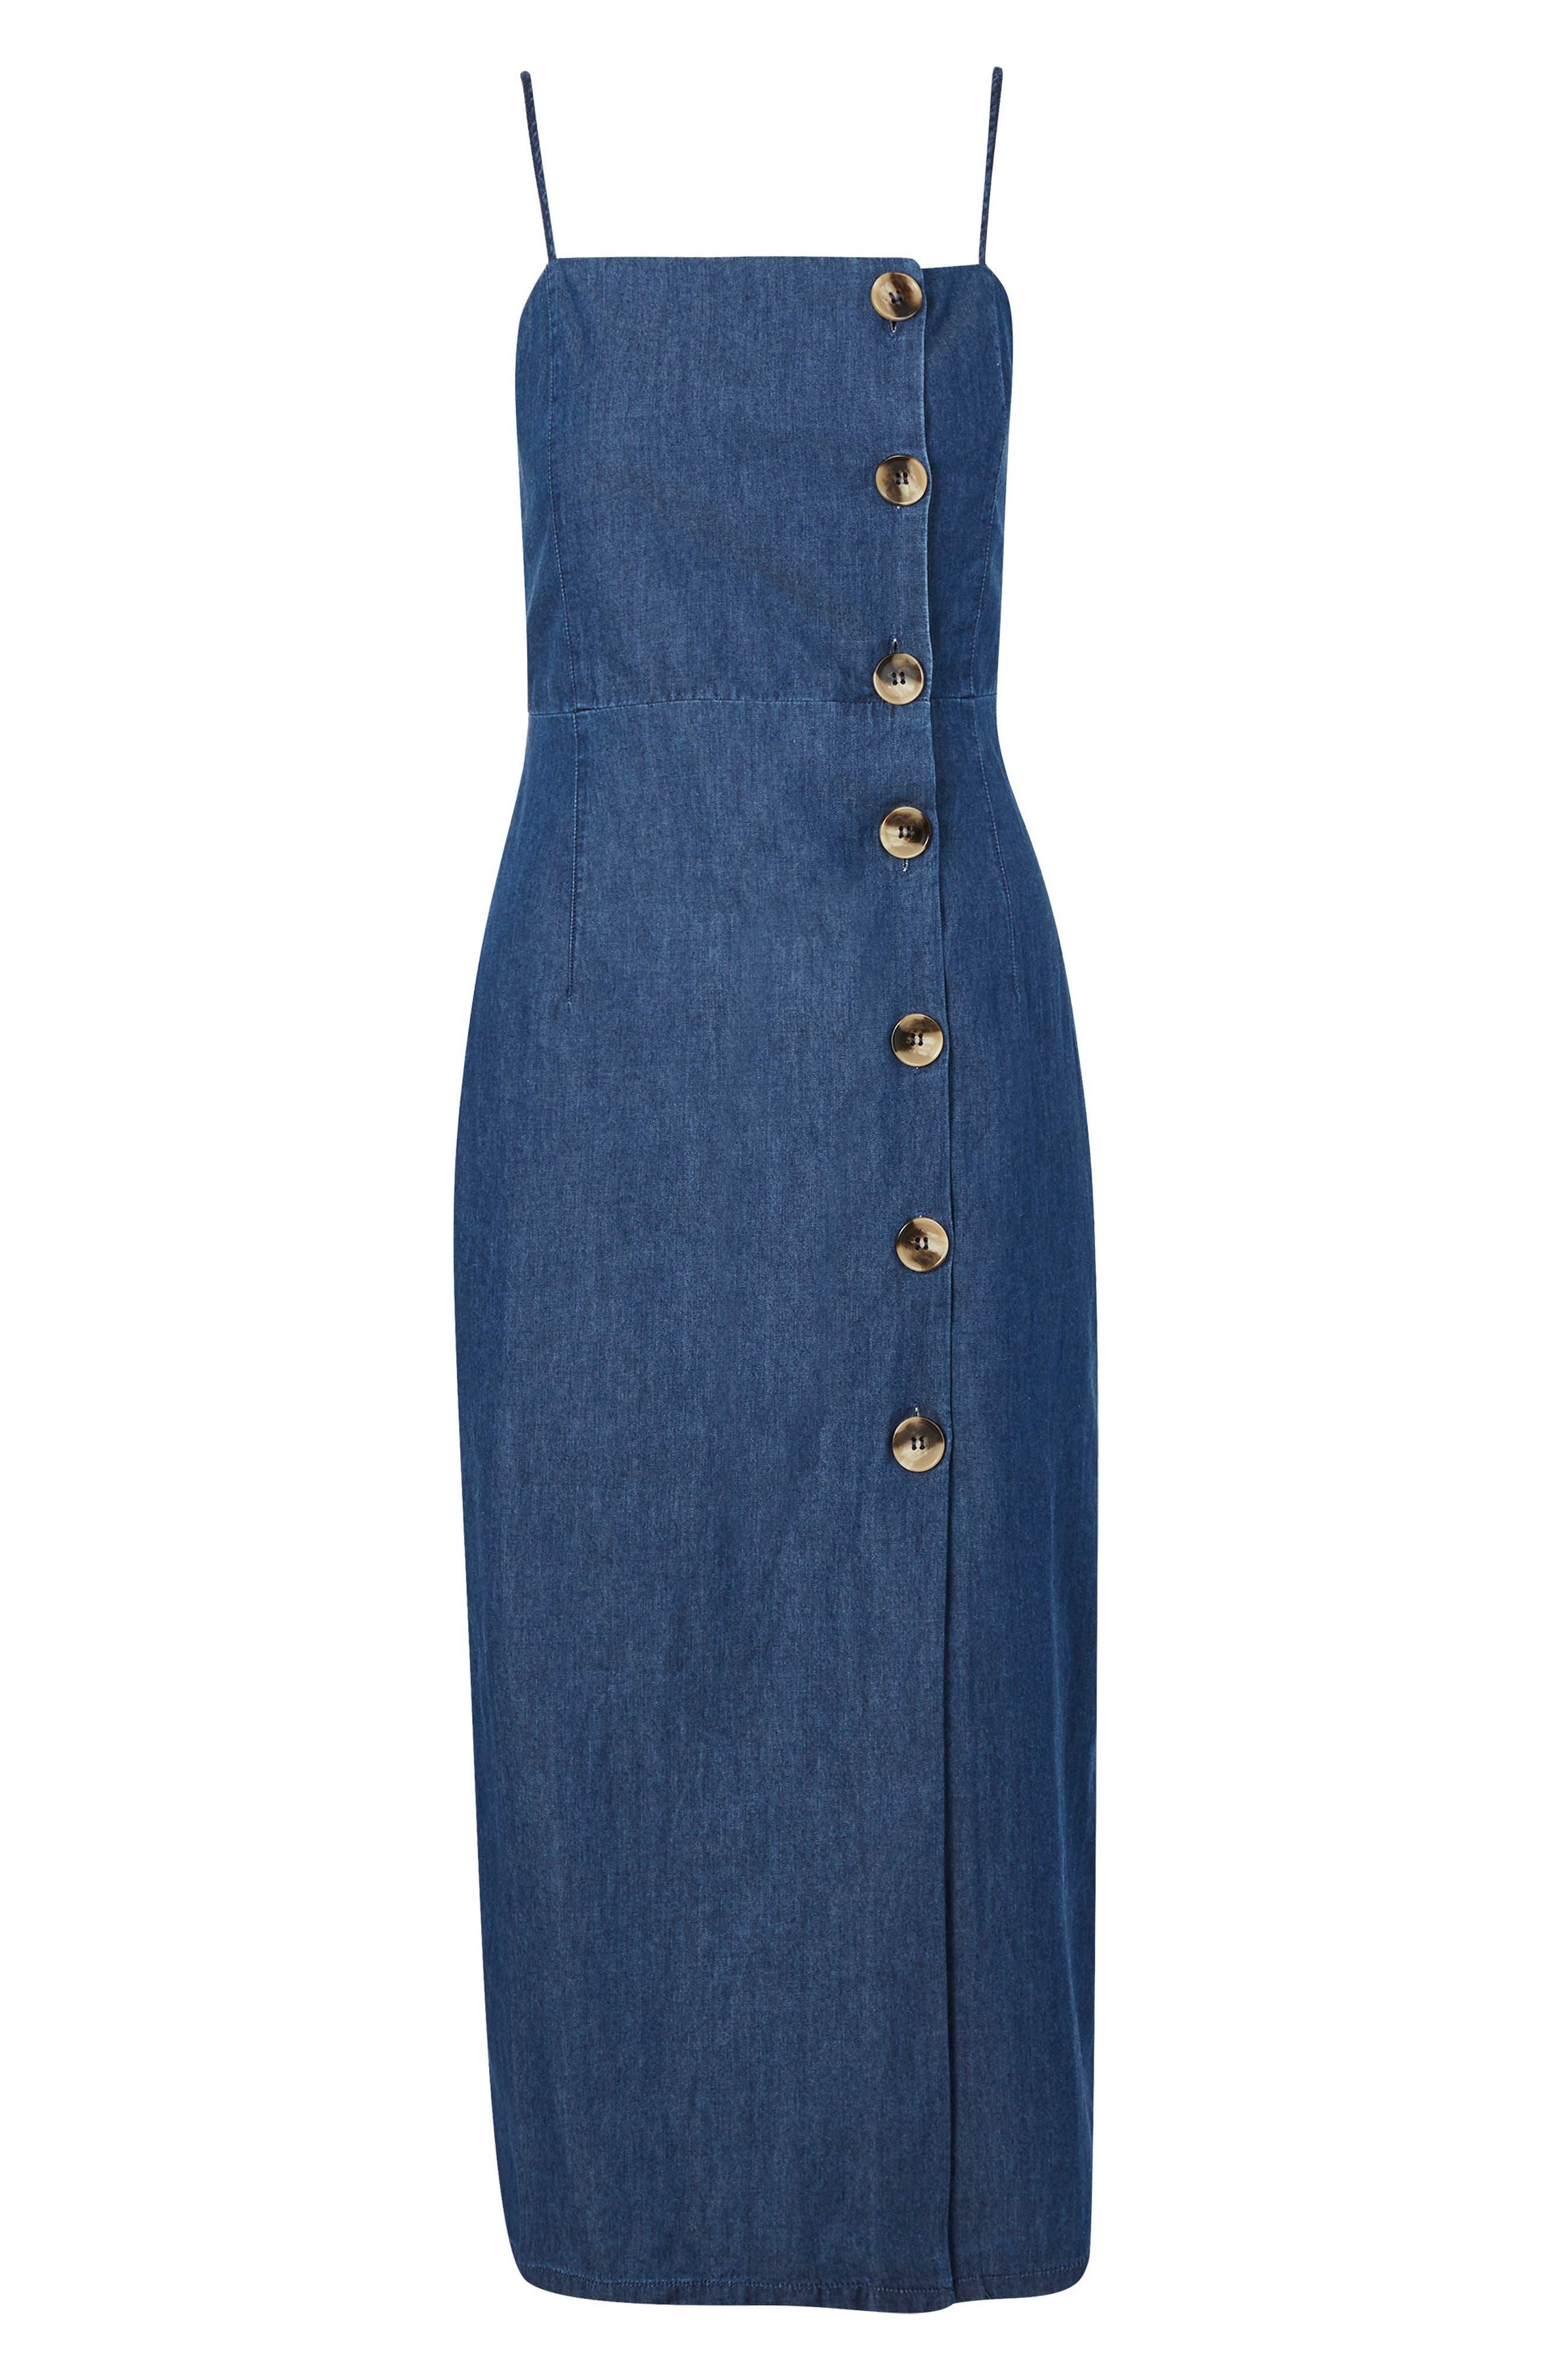 Horn Button Midi Dress,                             Alternate thumbnail 4, color,                             420